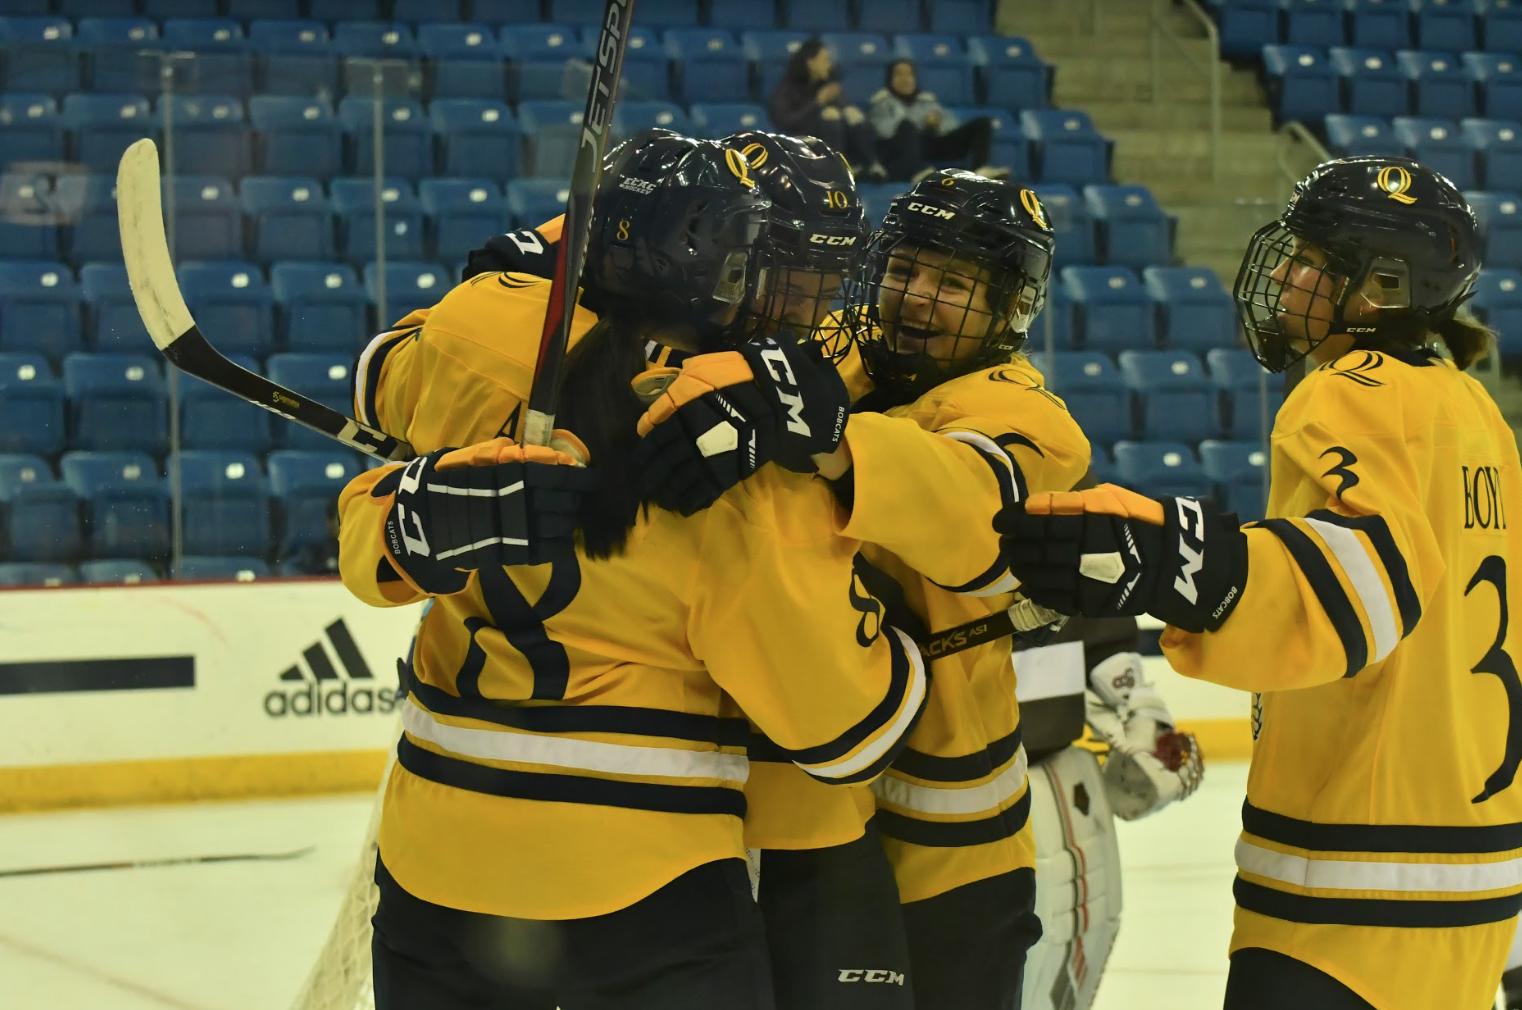 Quinnipiac women's ice hockey blanks Brown for first win of the season